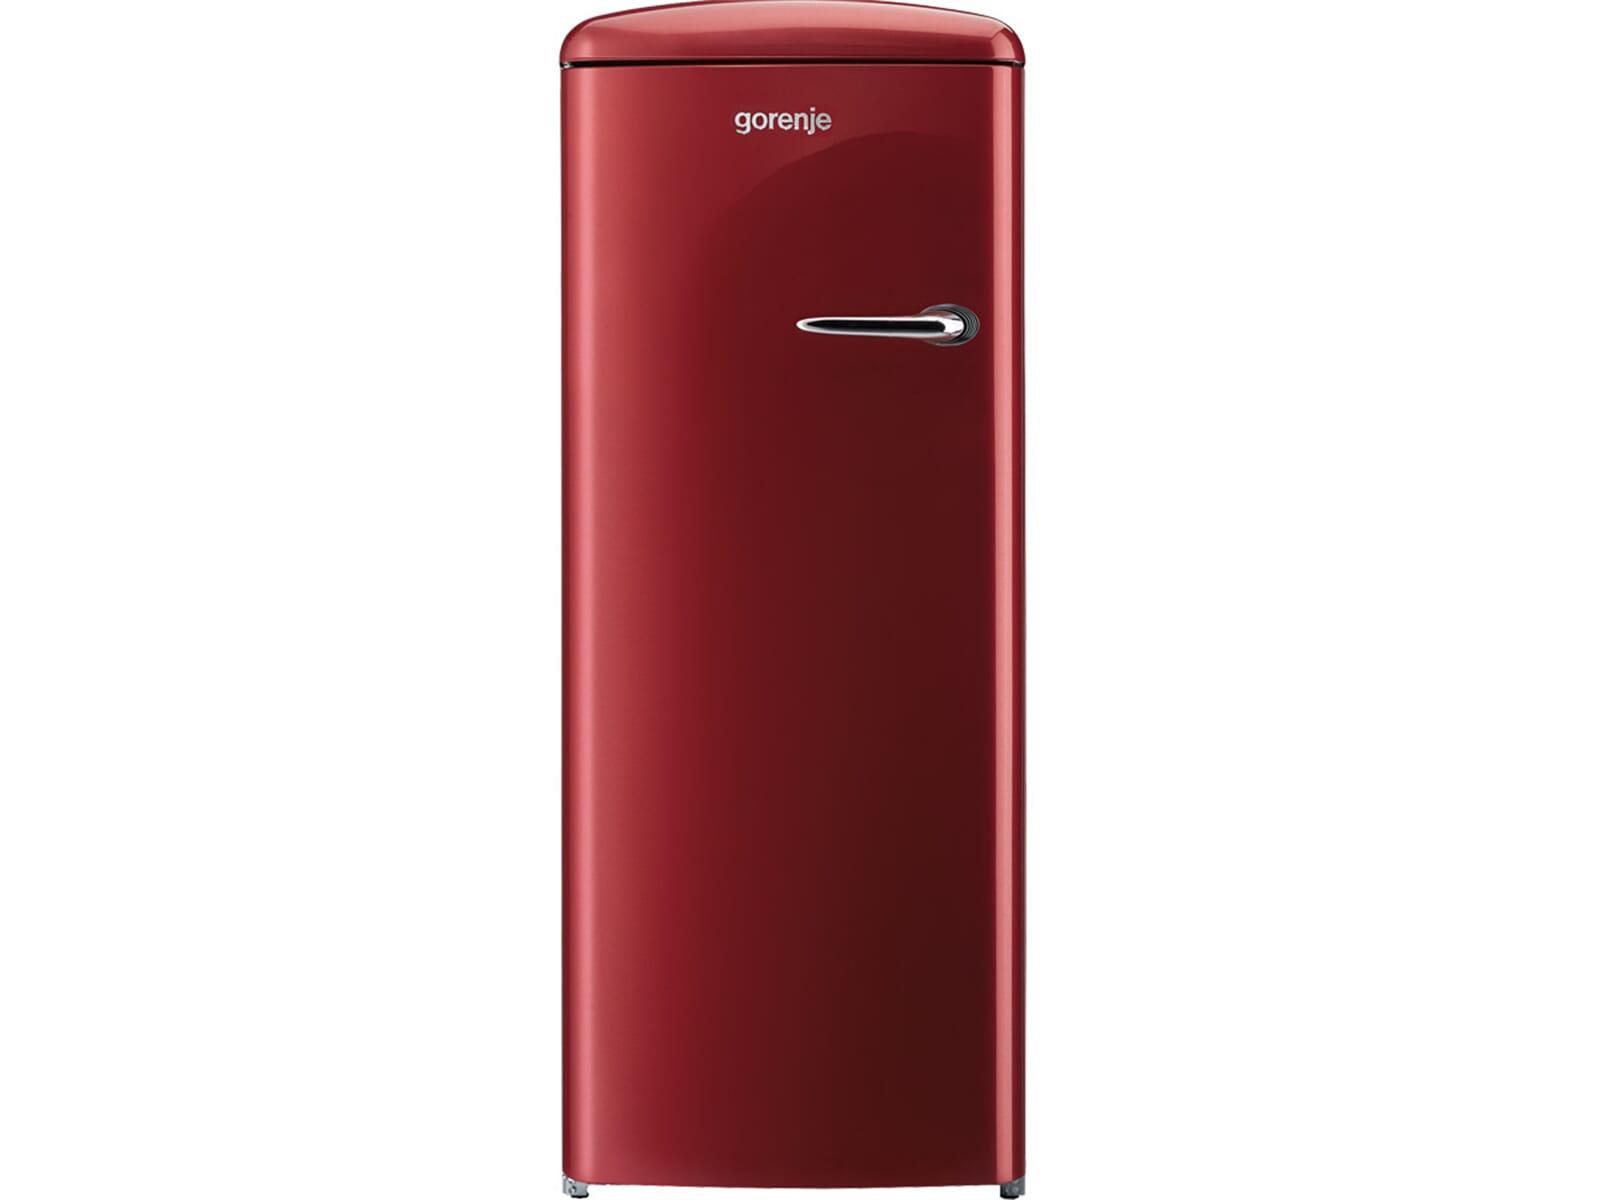 Retro Kühlschrank Rot Gorenje : Perfekt gorenje kühl retro rk für je statt sehr